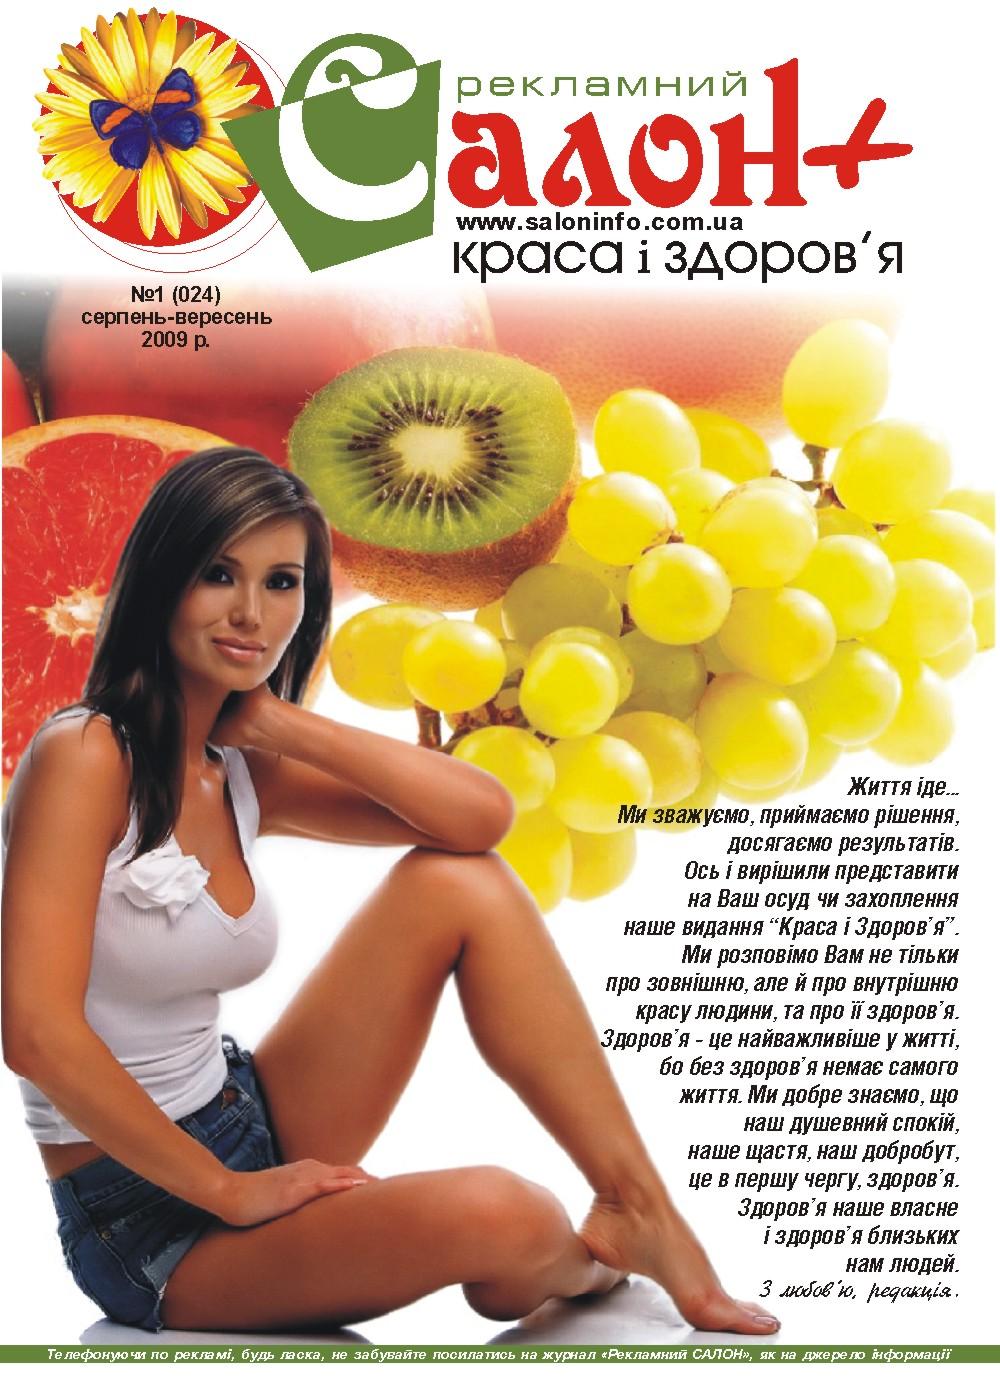 Picture 1 - krasa-1.jpg